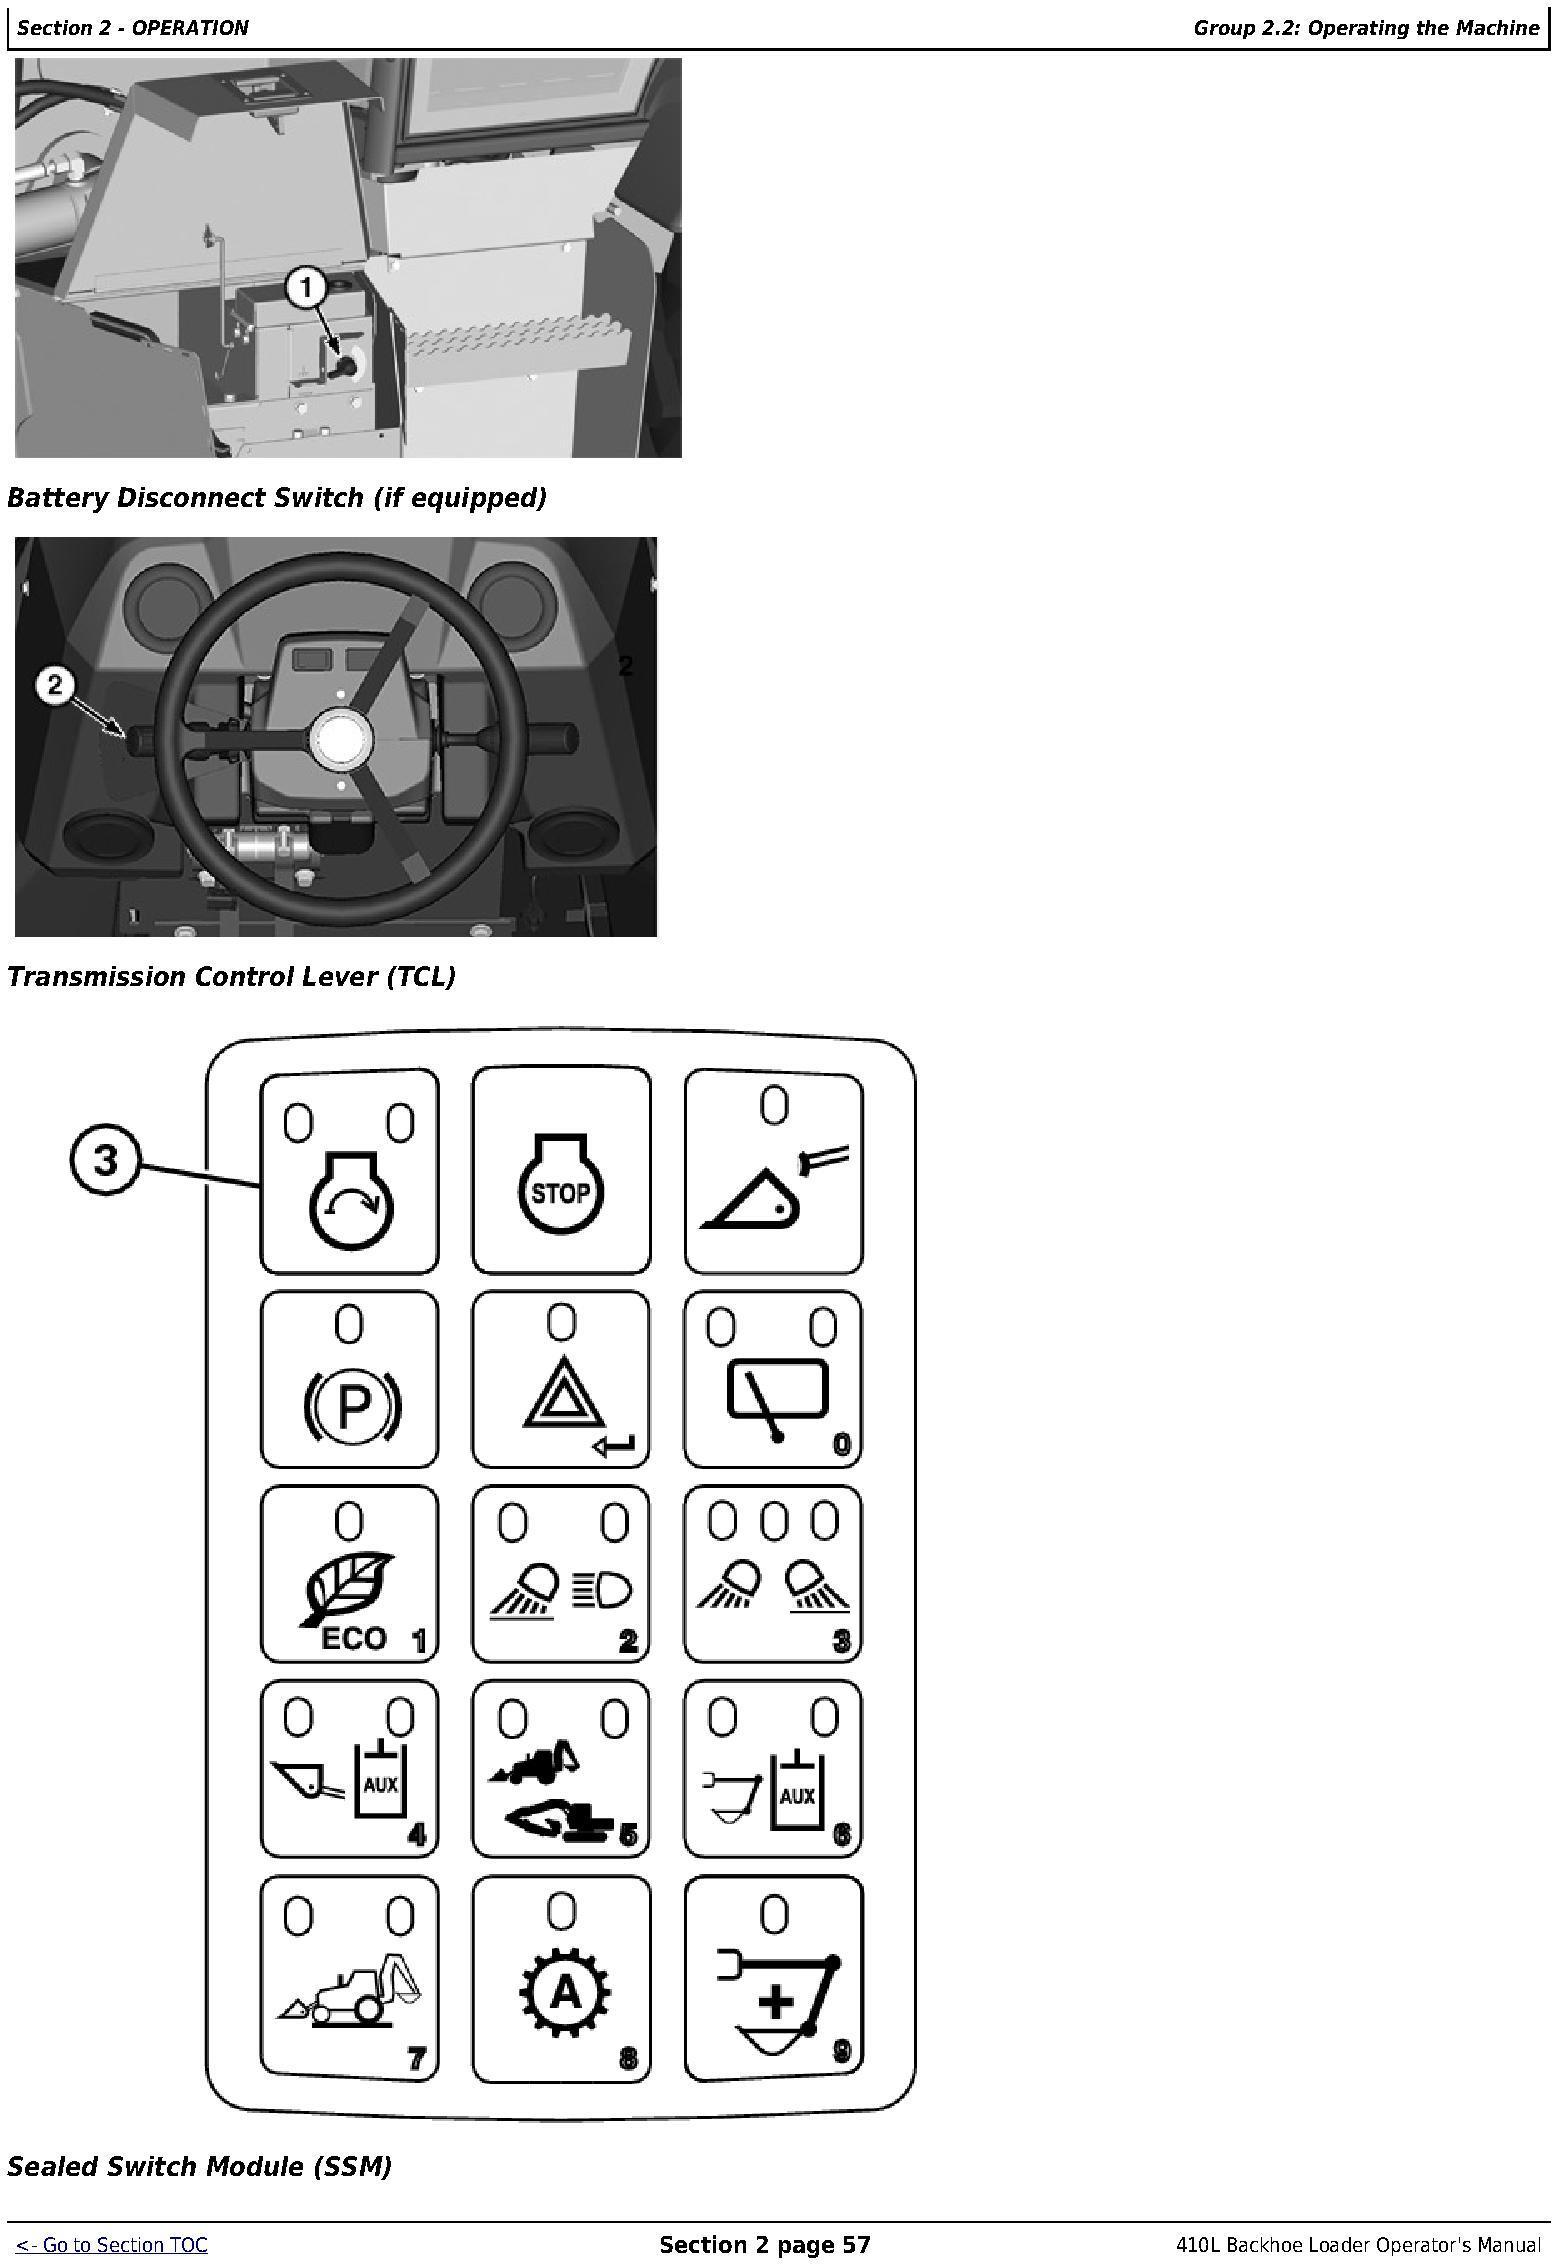 OMT357556X19 - JD John Deere 410L Backhoe Loader Operators Manual (sn. C273920-; D273920-) - 2